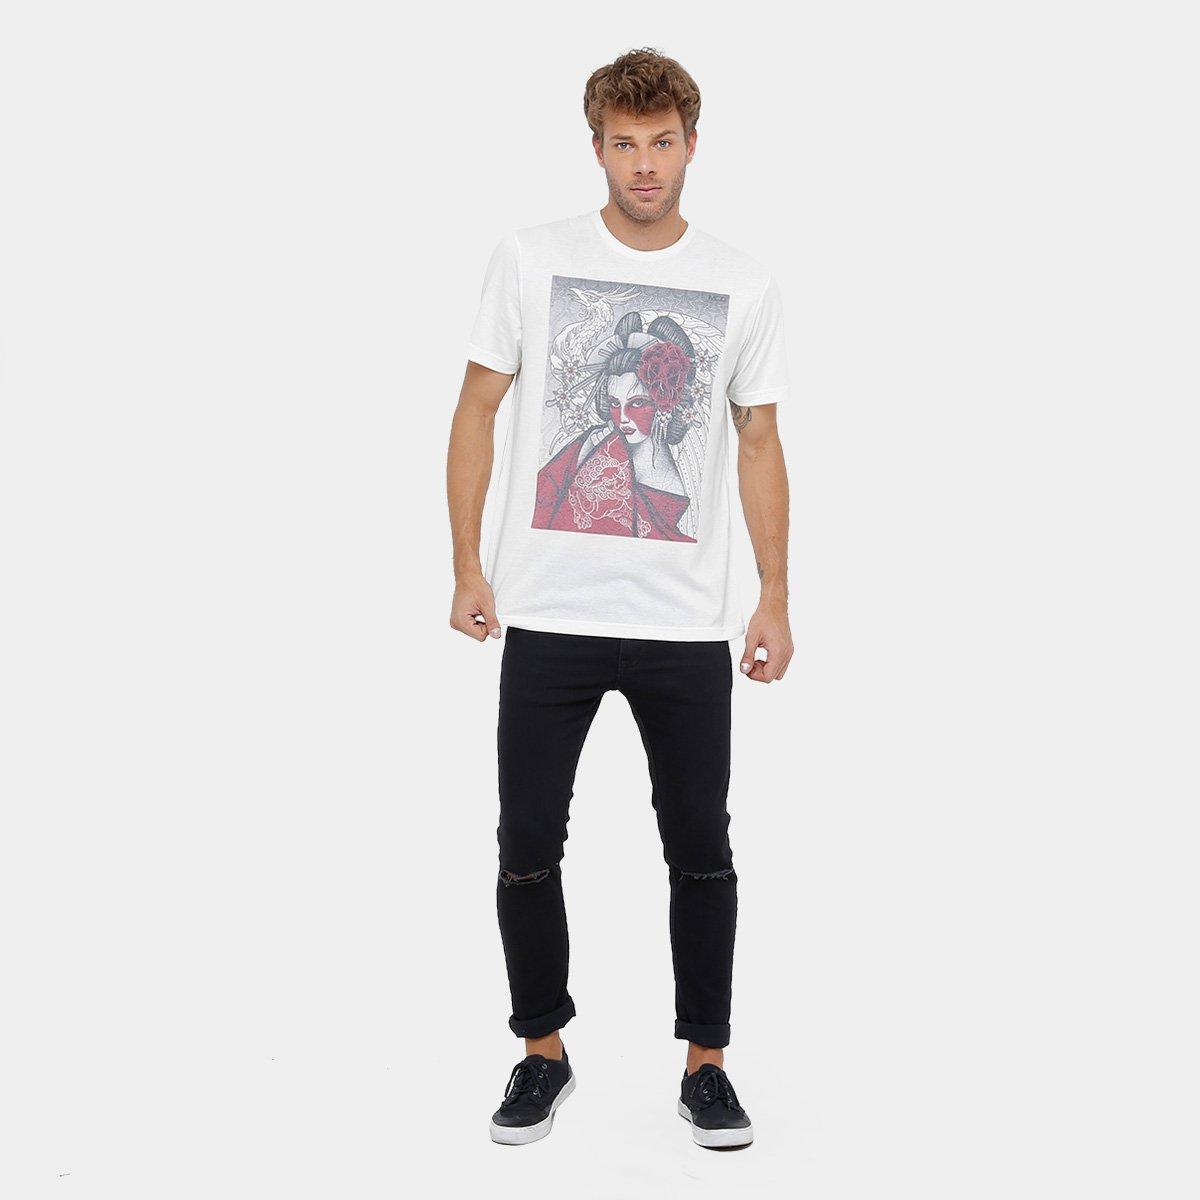 Camiseta MCD Especial Body Tattoo Gueixa Hiro Masculina - Compre ... e42e28a147b